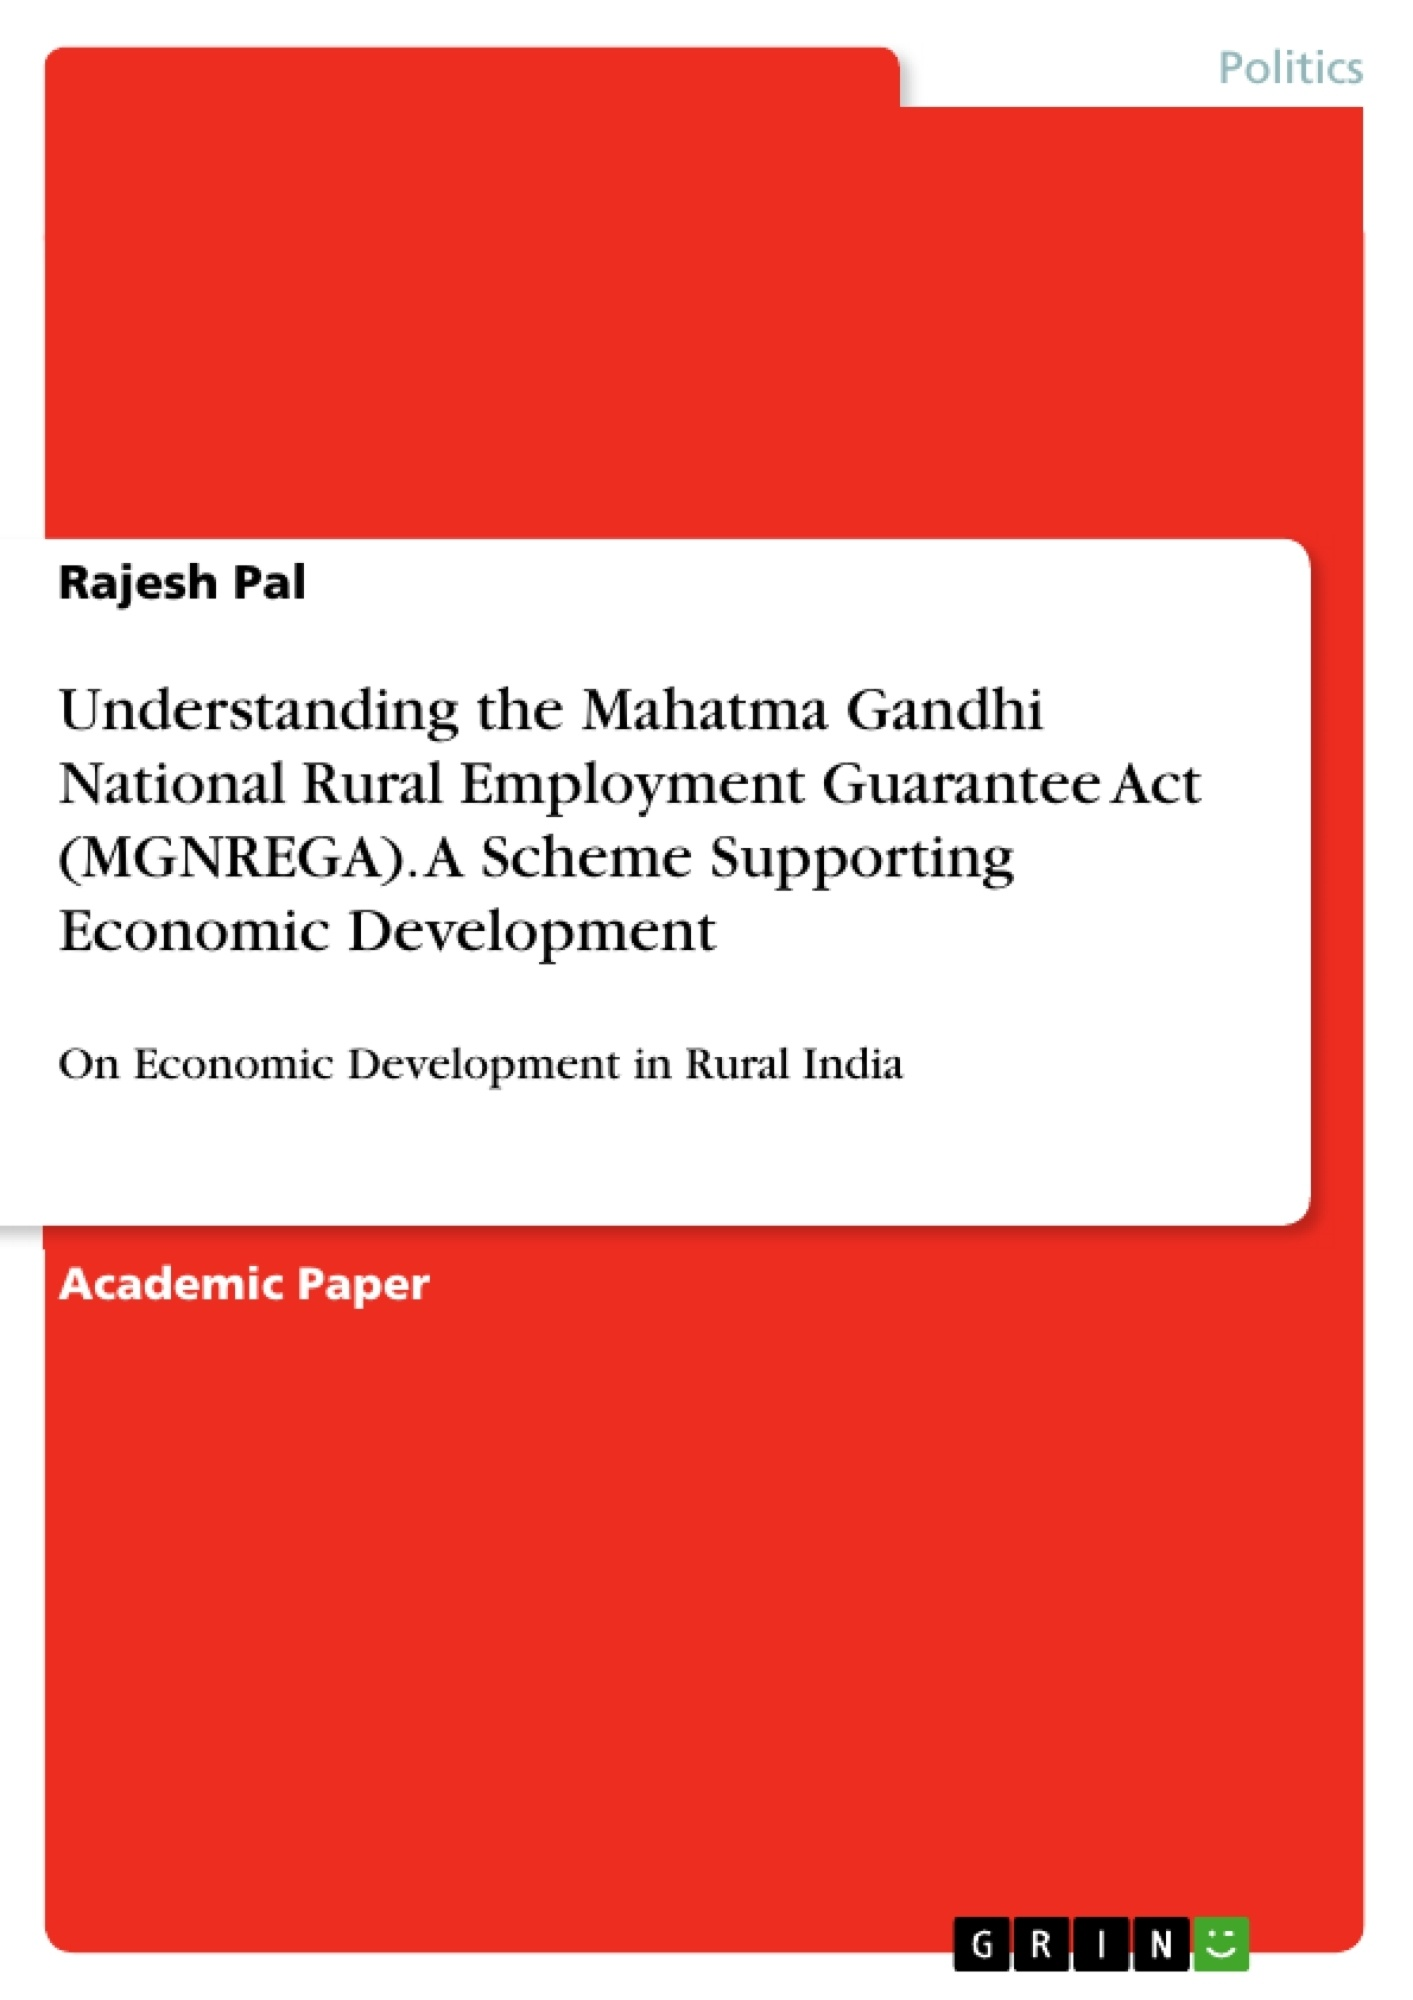 Title: Understanding the Mahatma Gandhi National Rural Employment Guarantee Act (MGNREGA). A Scheme Supporting Economic Development